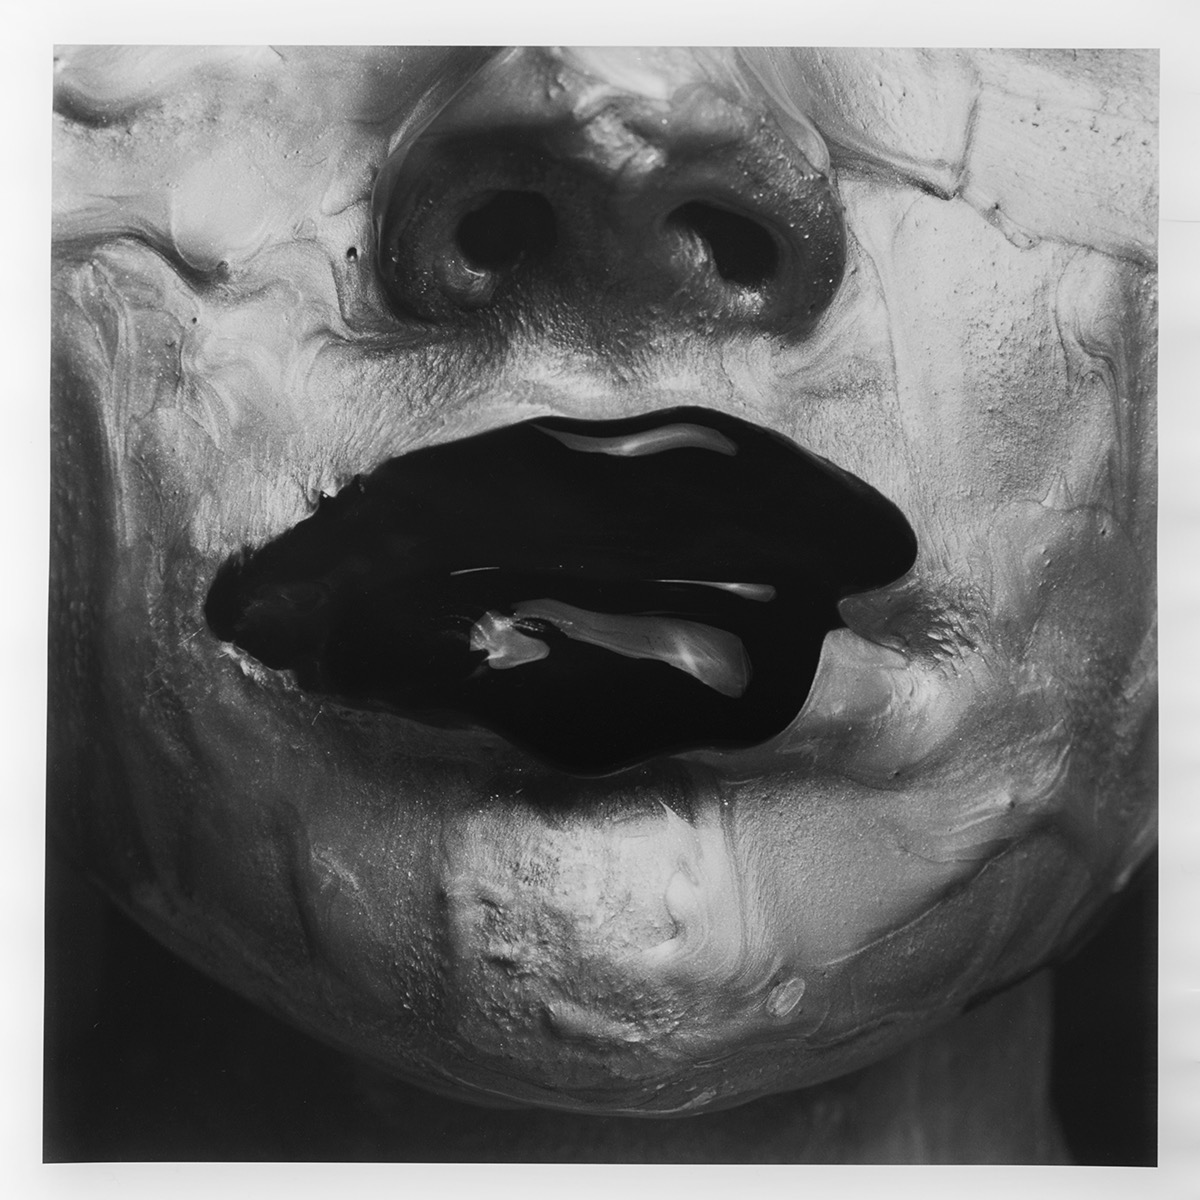 Monochrome by Tyler Shields